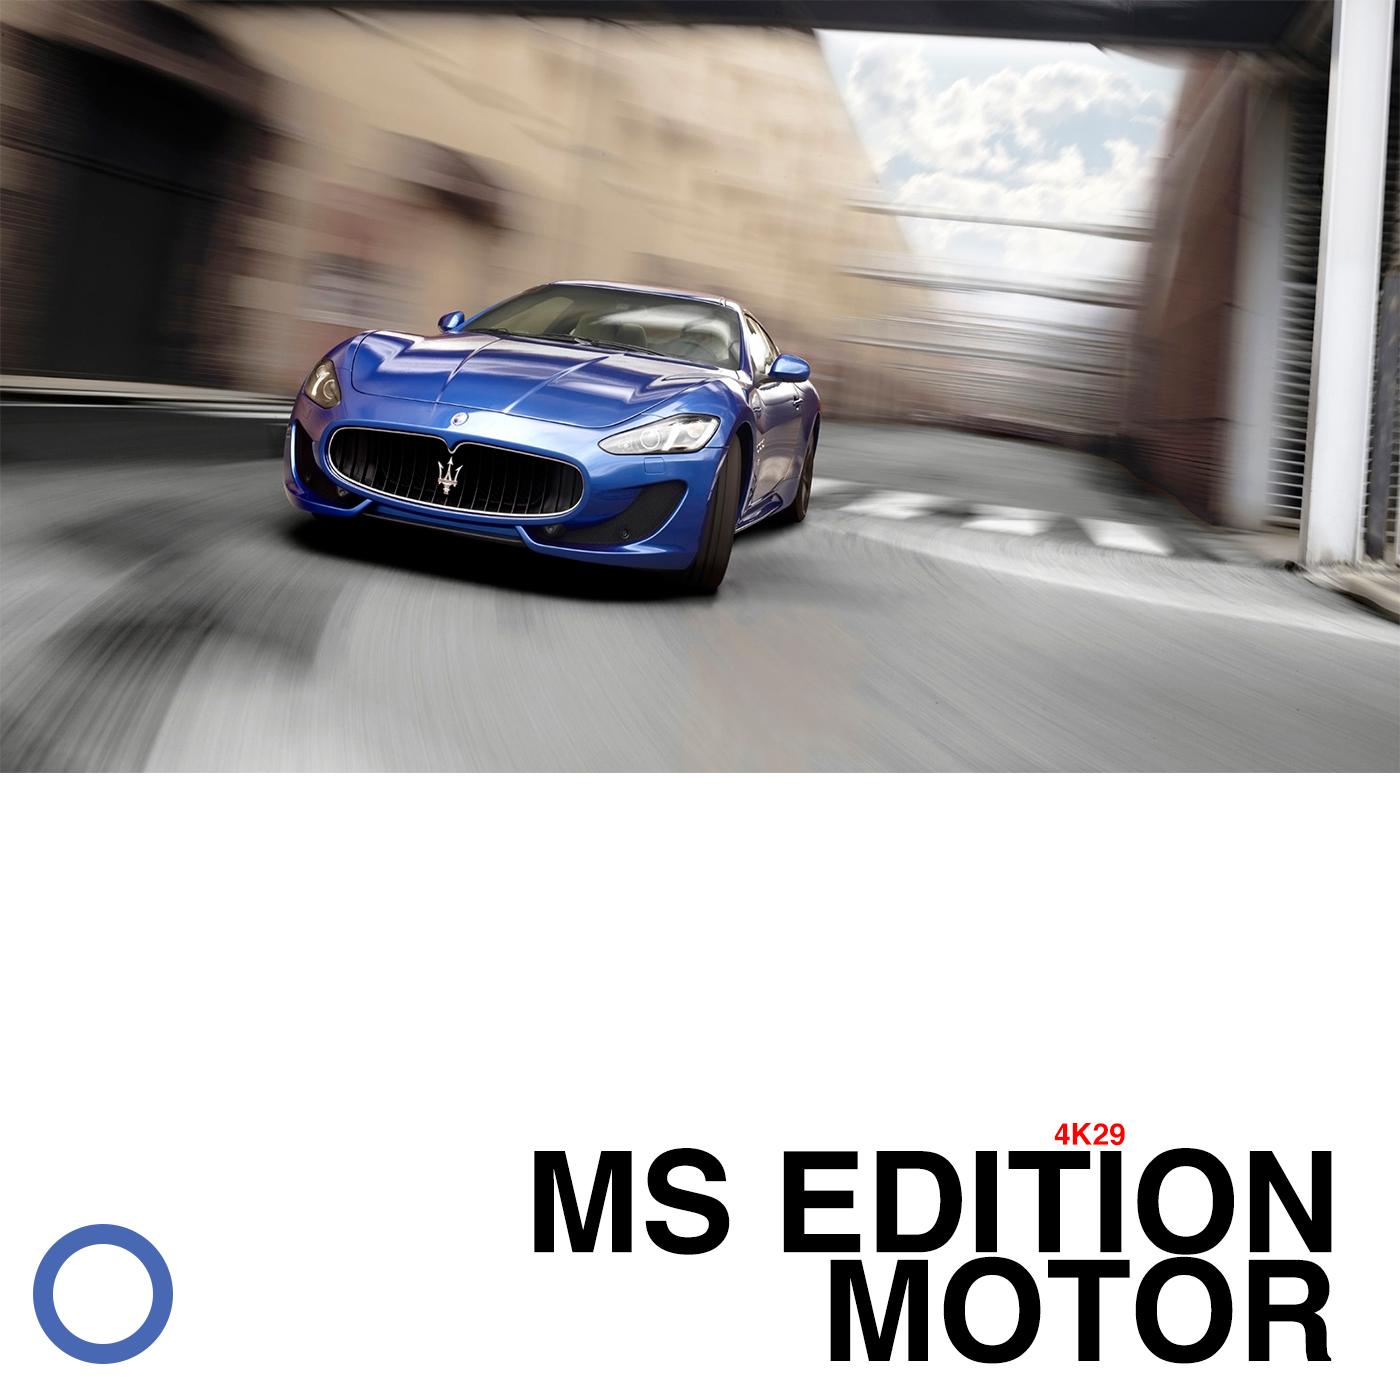 MS EDITION MOTOR 4K29